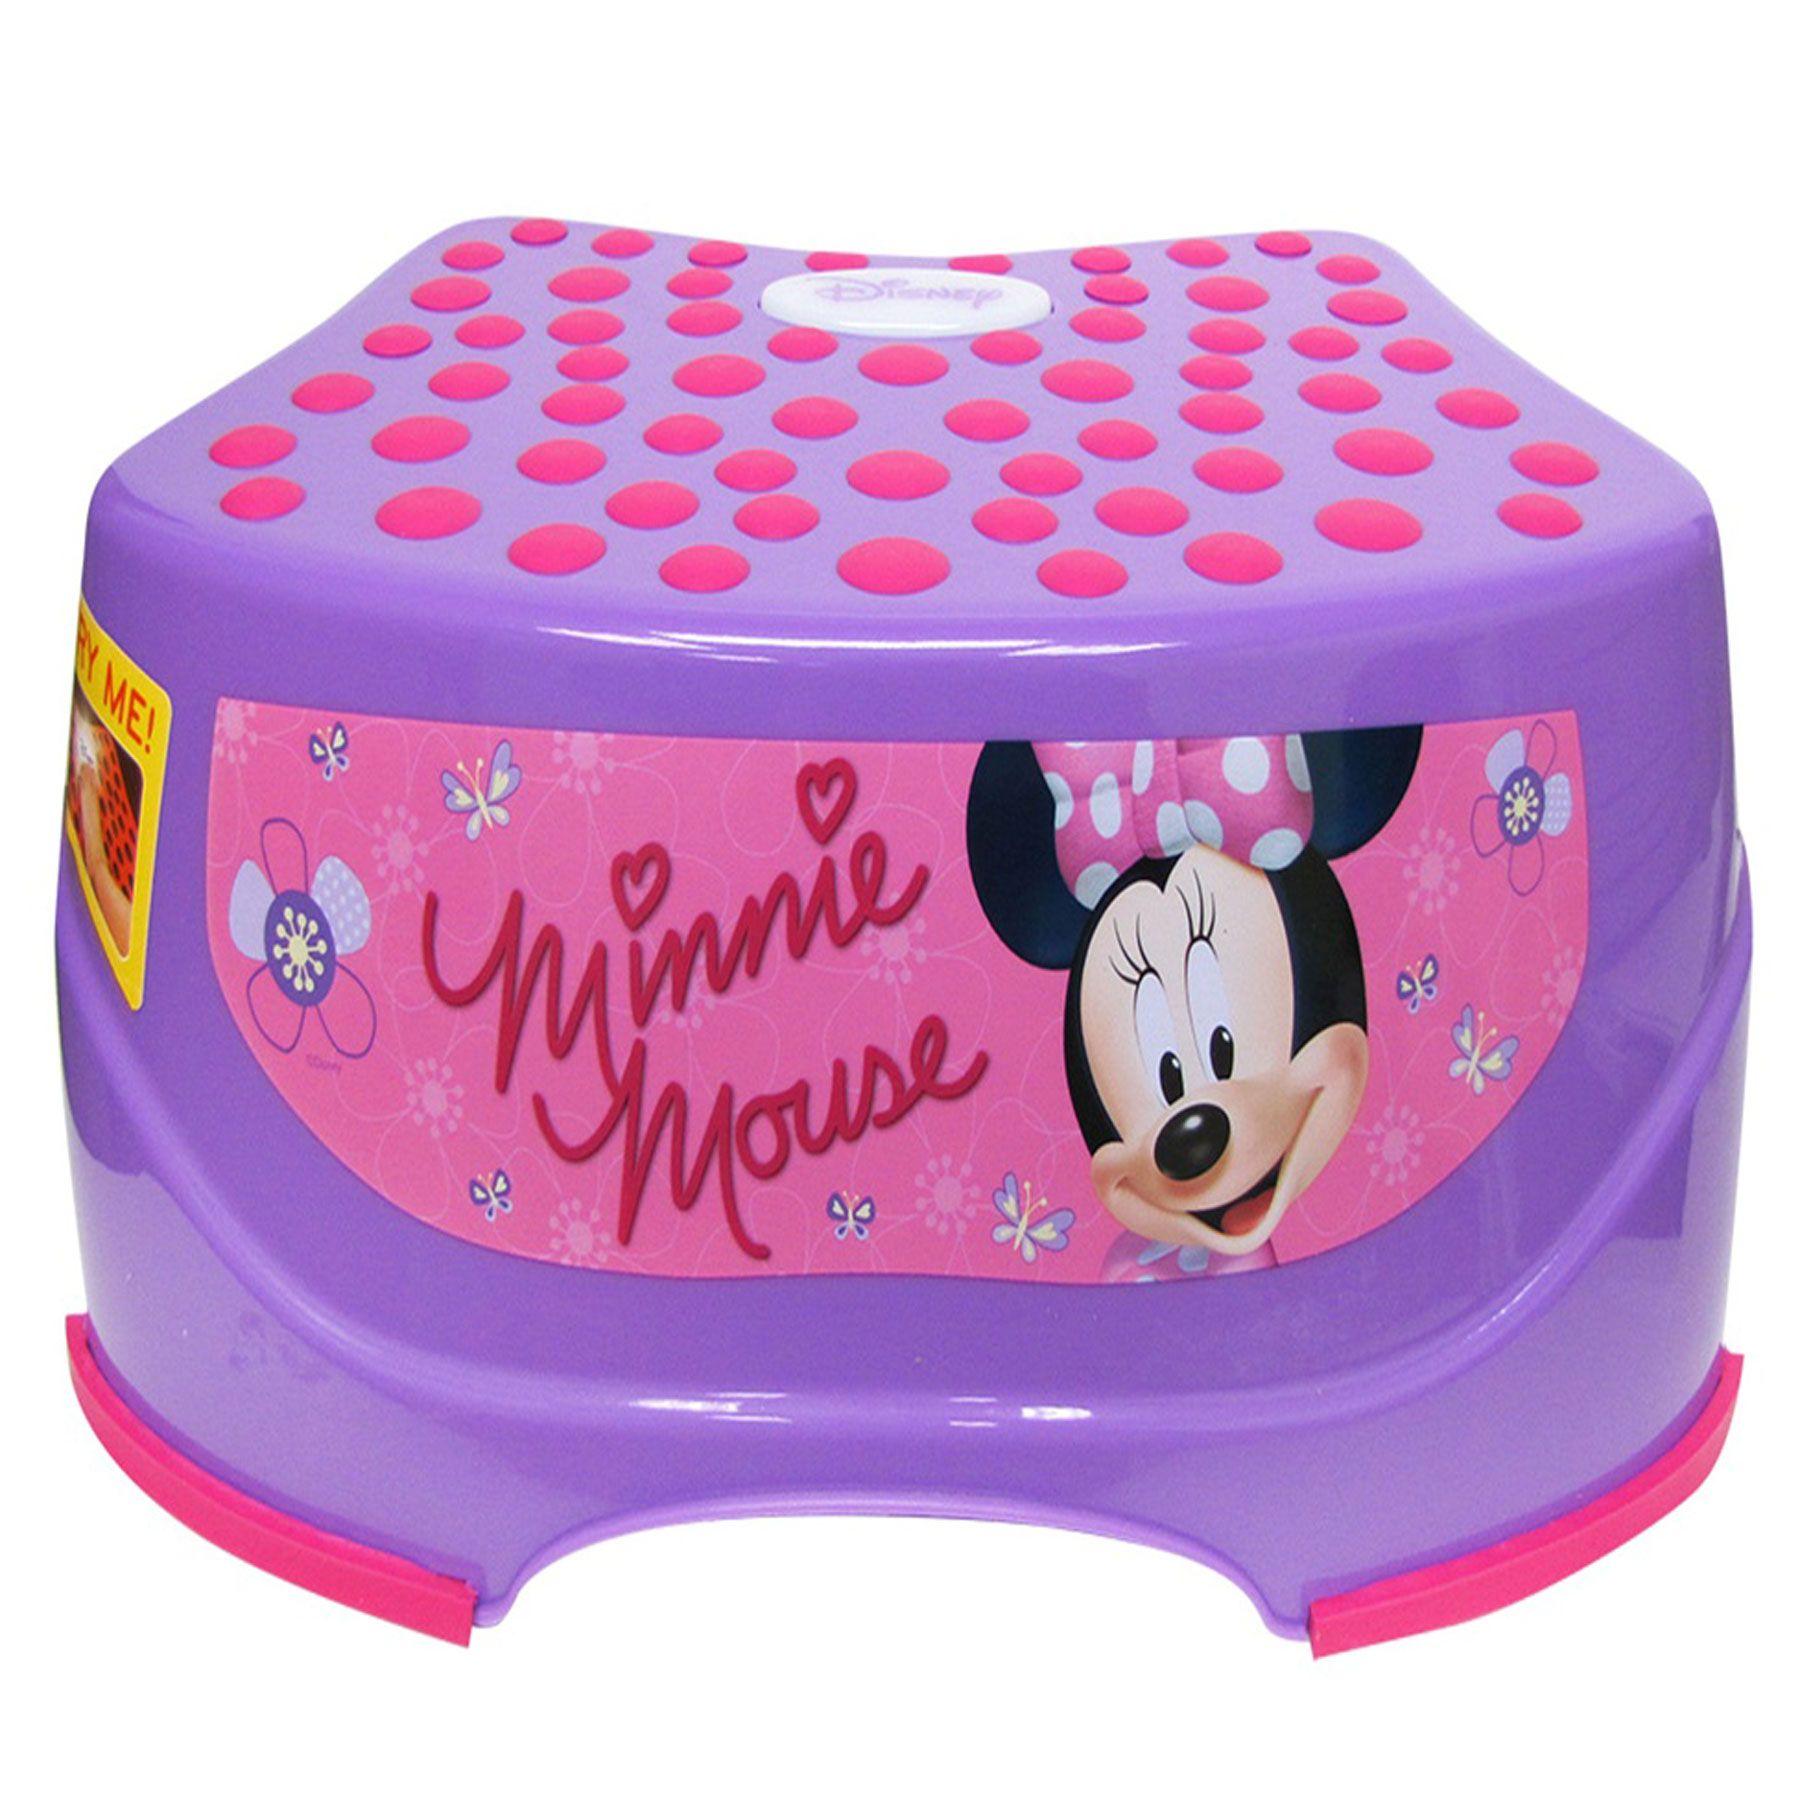 Minnie Mouse Step N Glow Step Stool Kids Bathroom